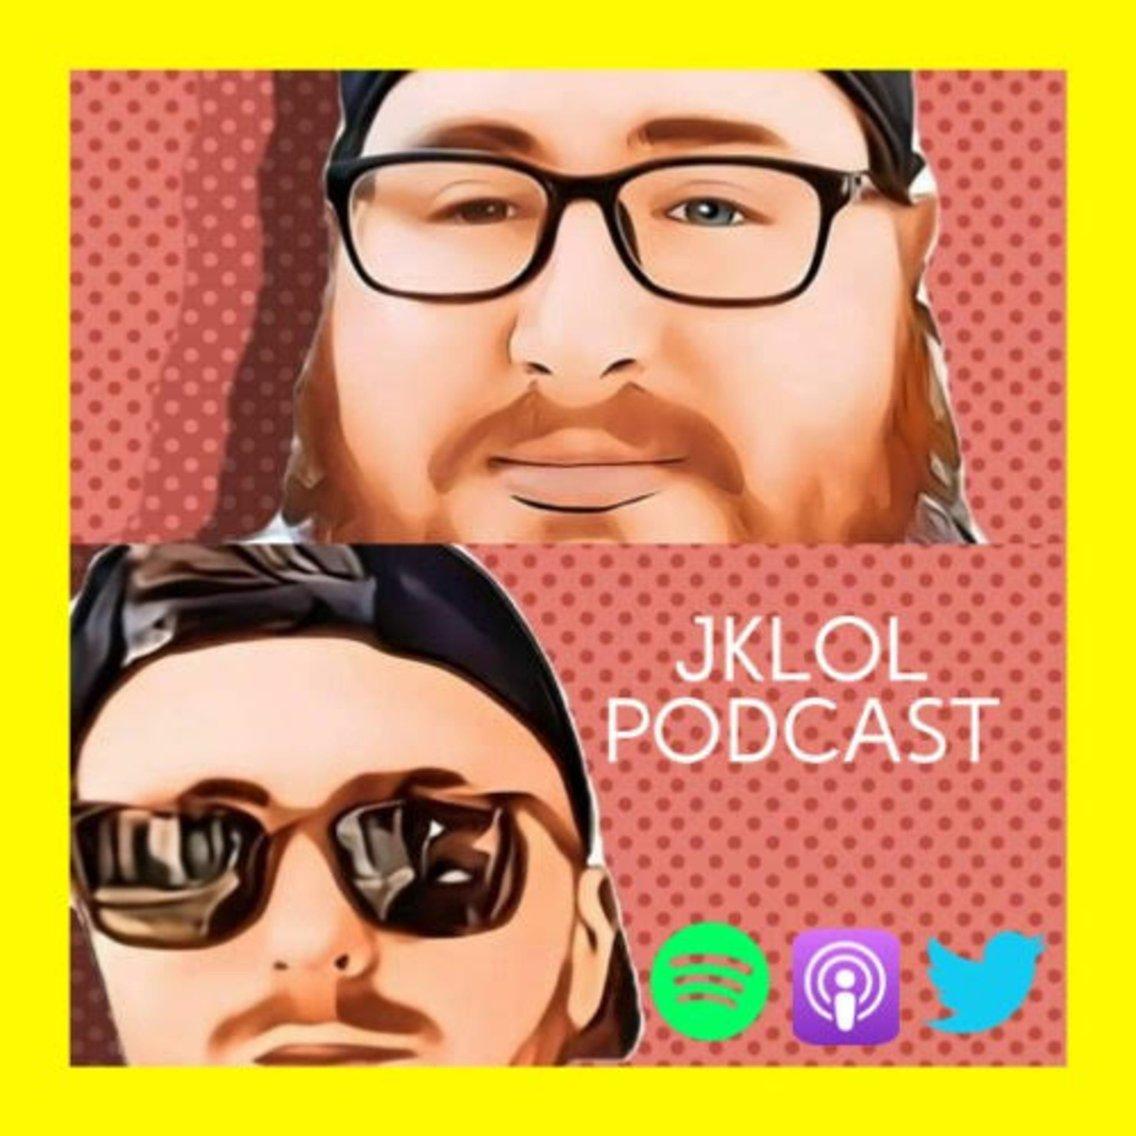 JKLOL Podcast - Cover Image